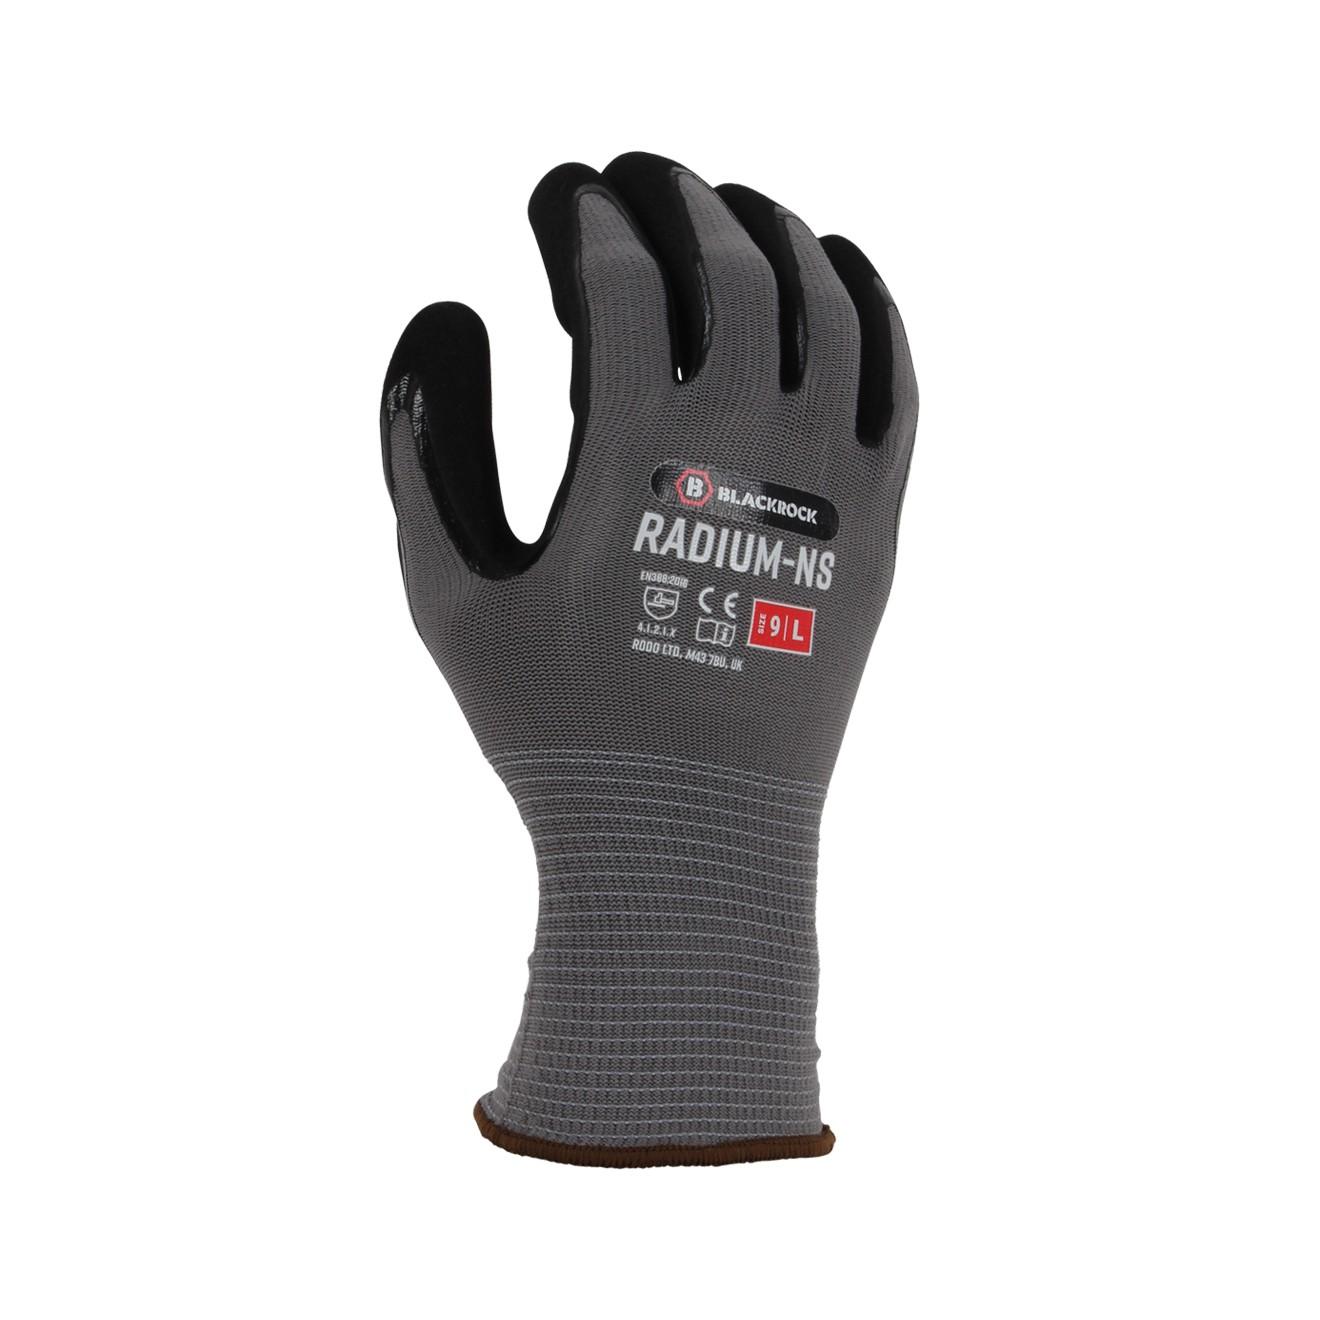 Radium-NS Work Glove